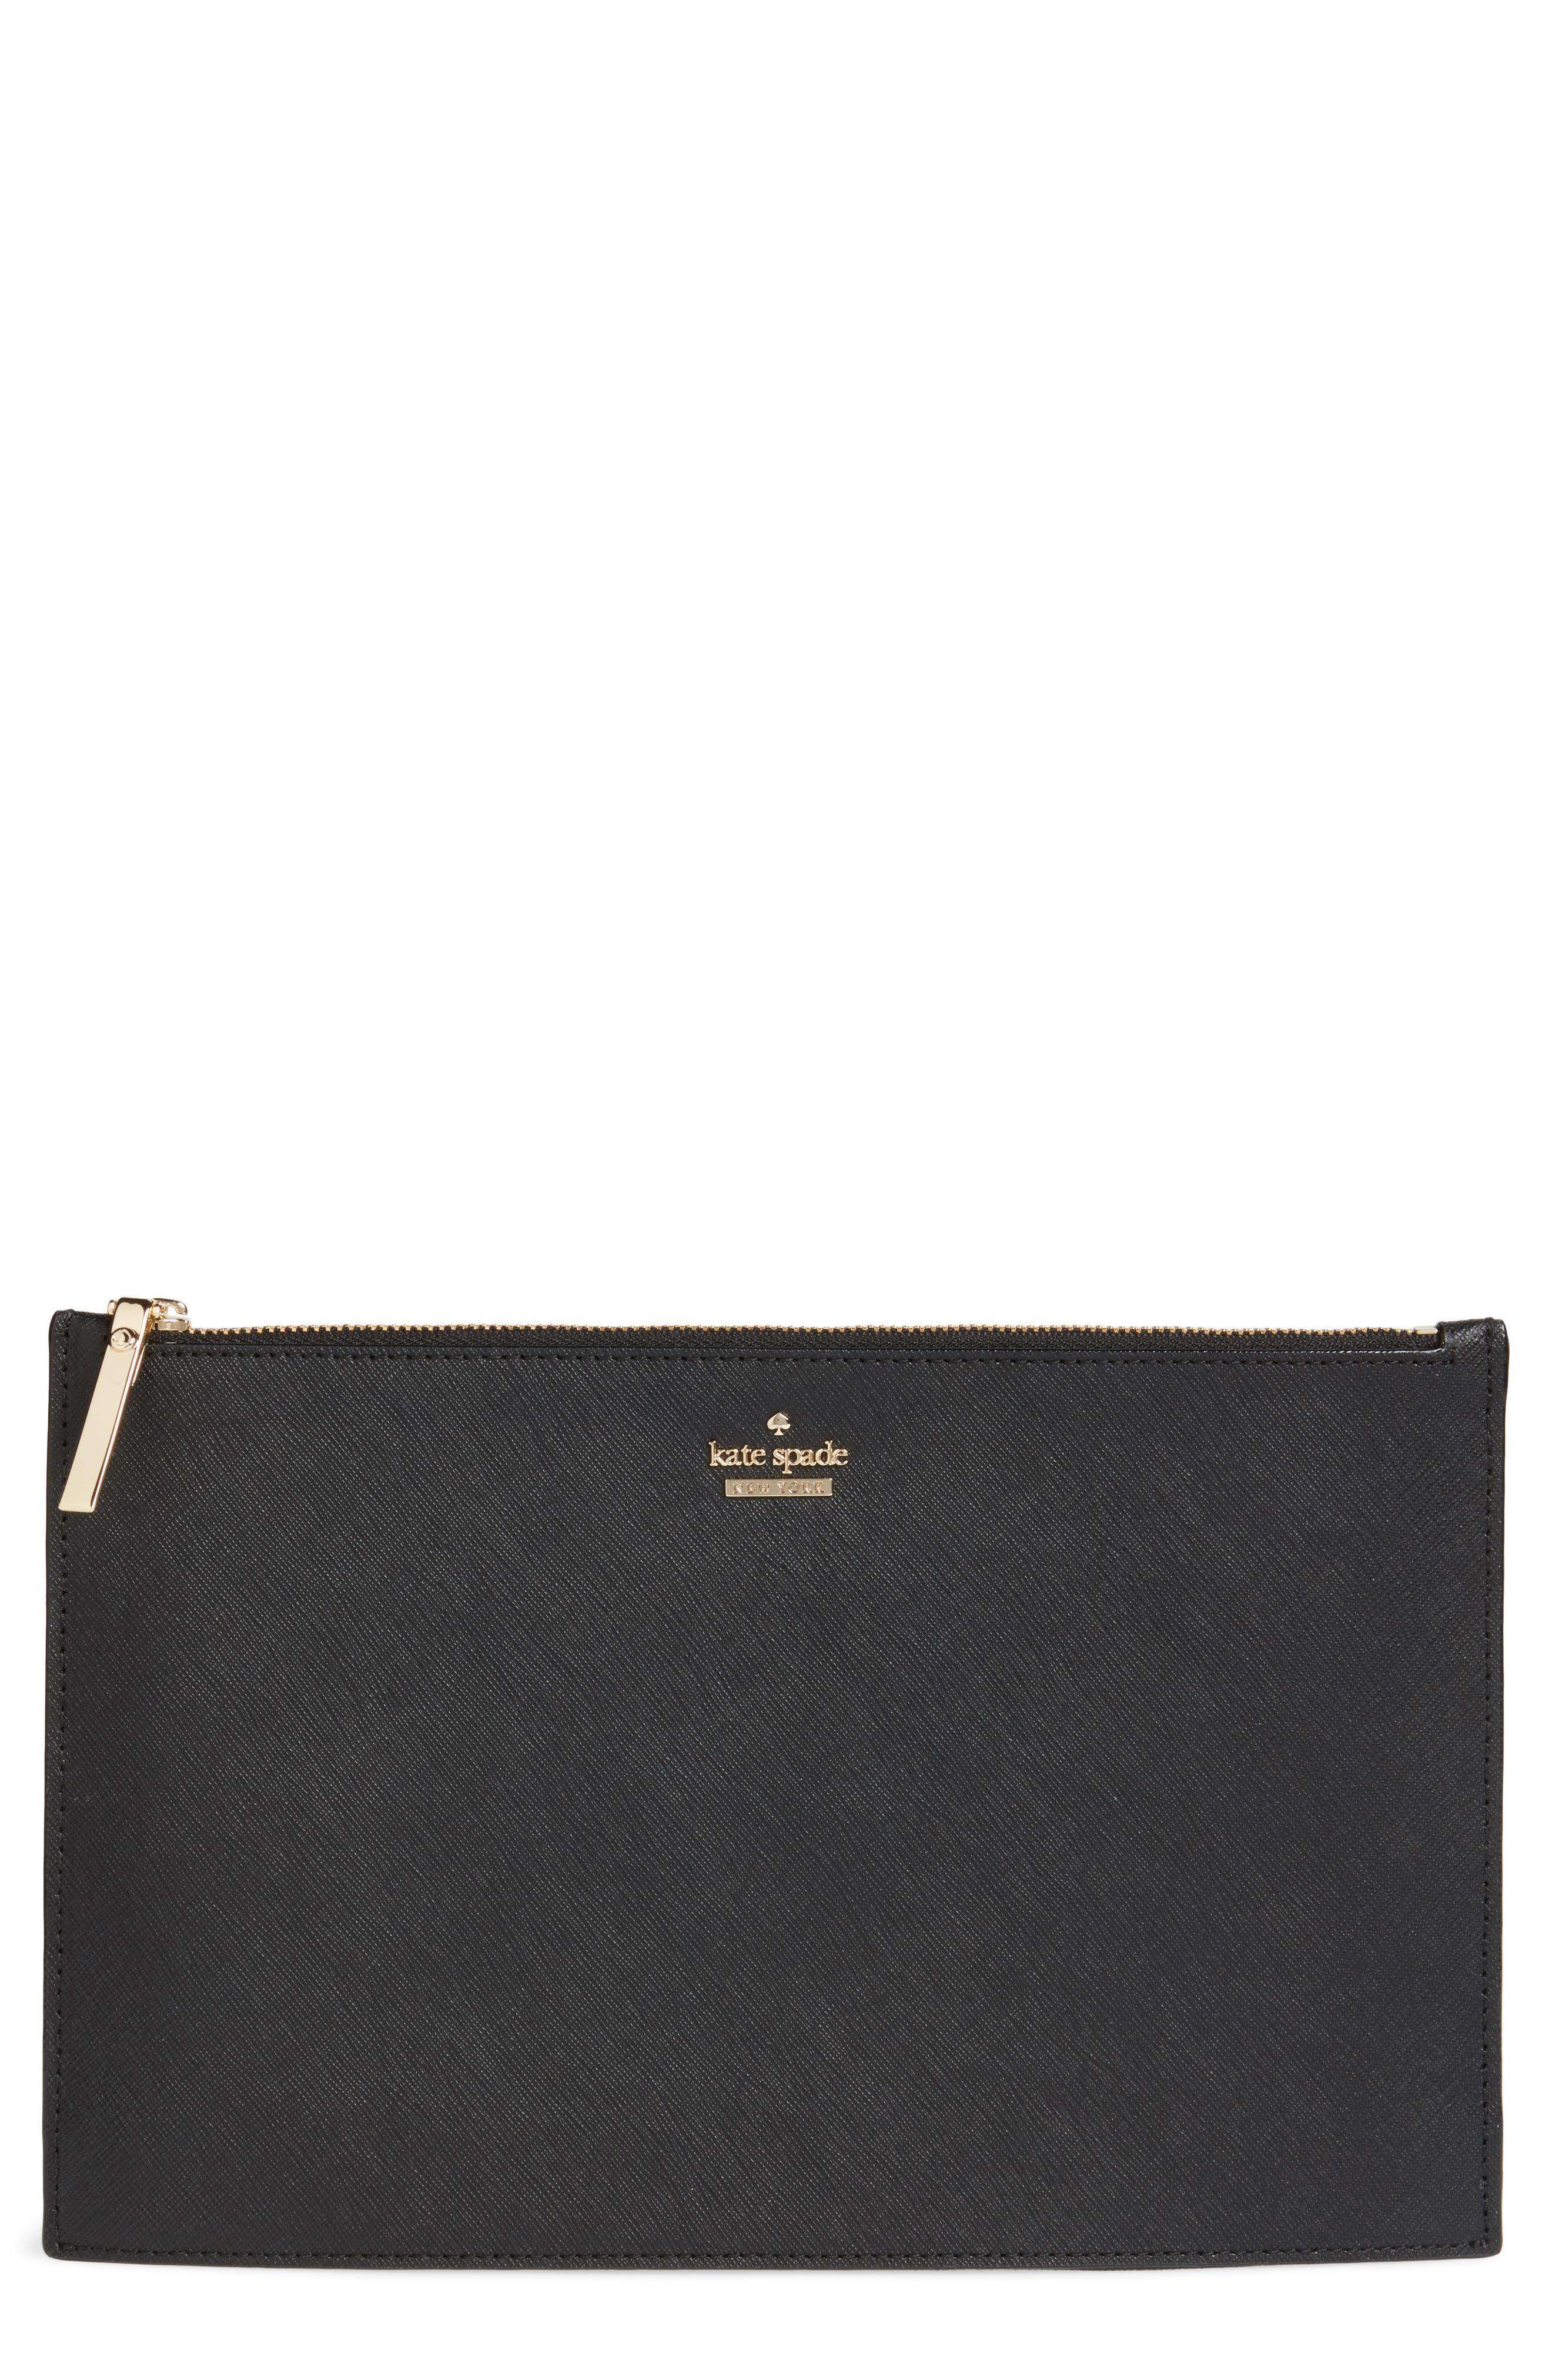 cameron street lilia leather clutch,                             Main thumbnail 1, color,                             Black